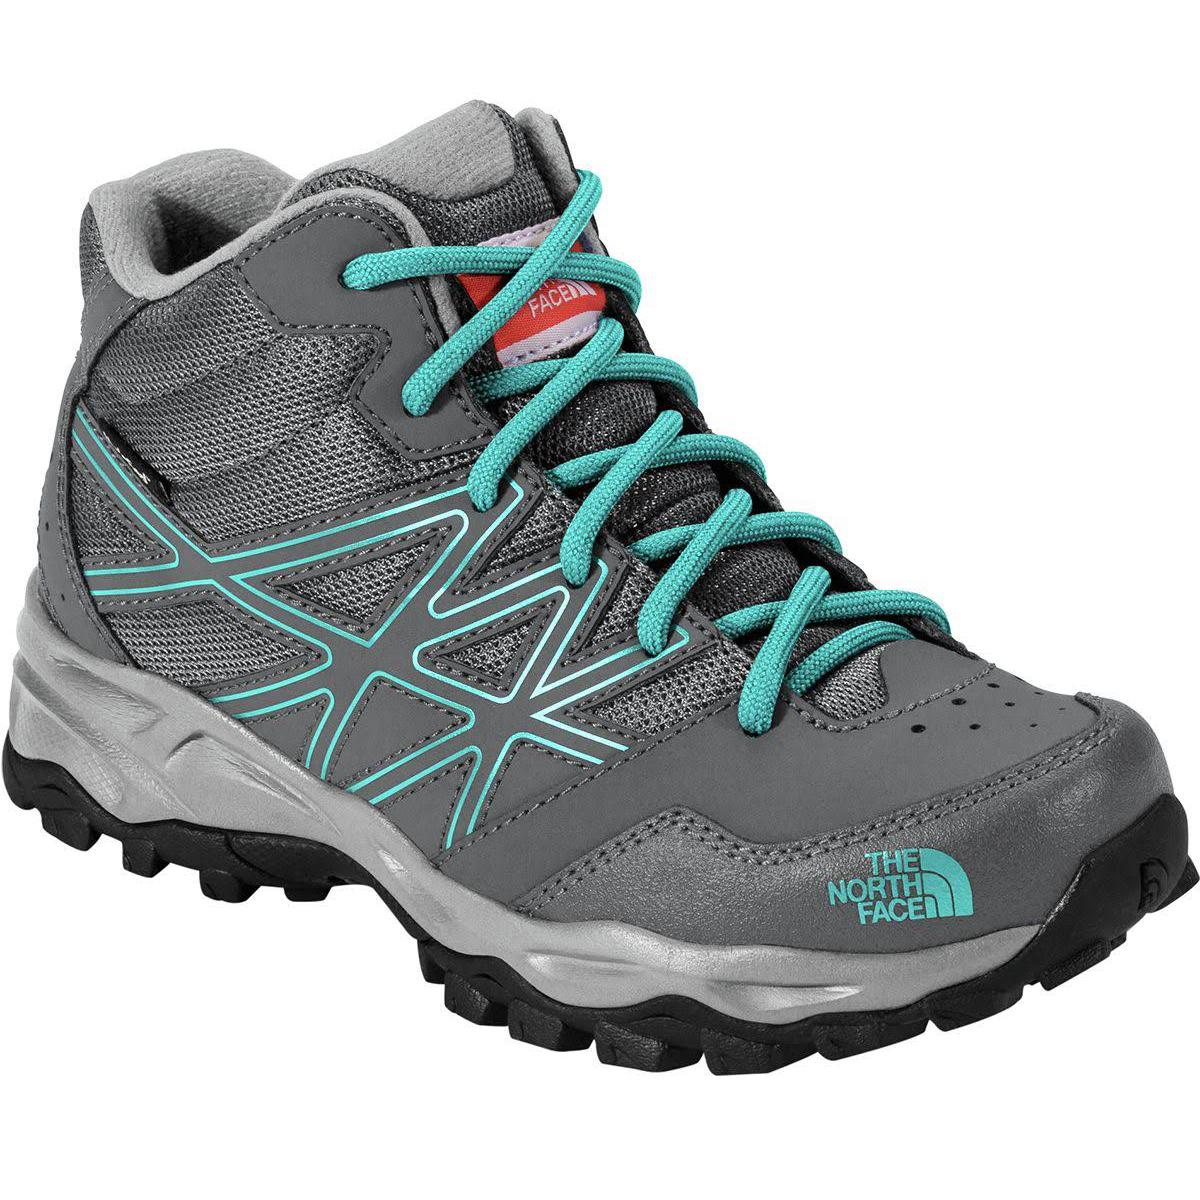 The North Face Kids' Jr Hedgehog Hiker Mid Waterproof Hiking Boots - Black, 4.5